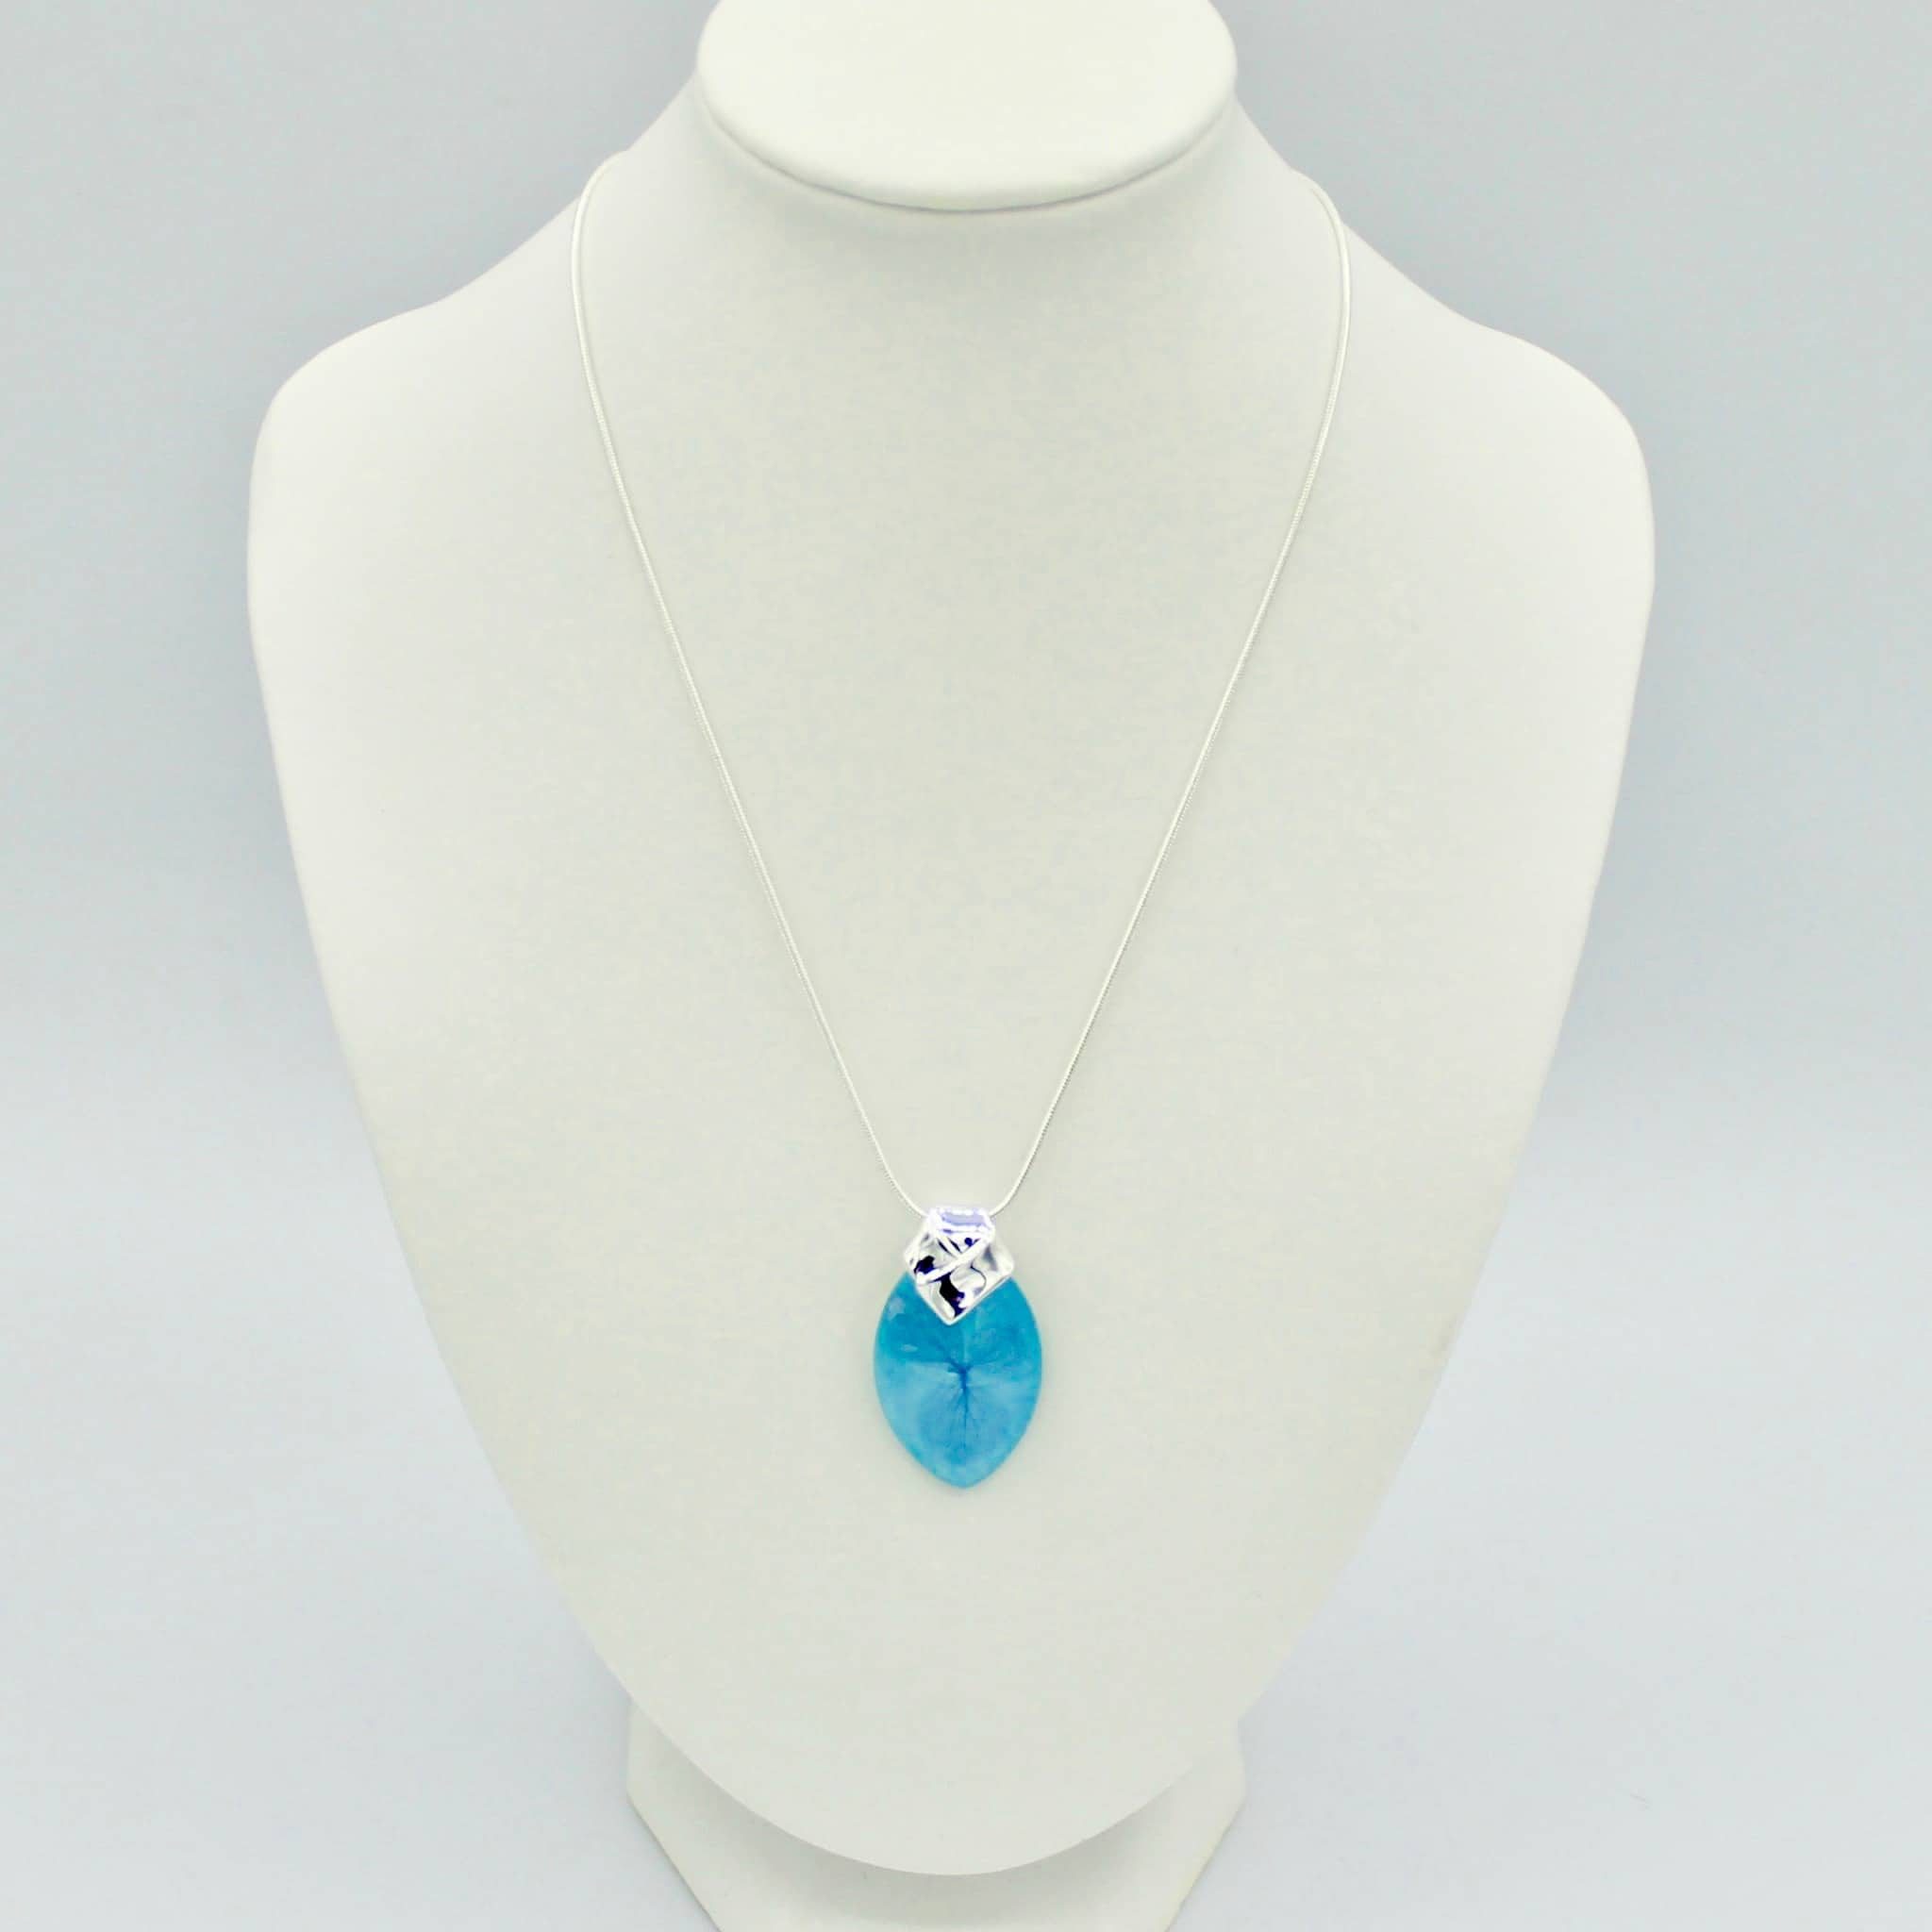 Blue Glass Stone Necklace